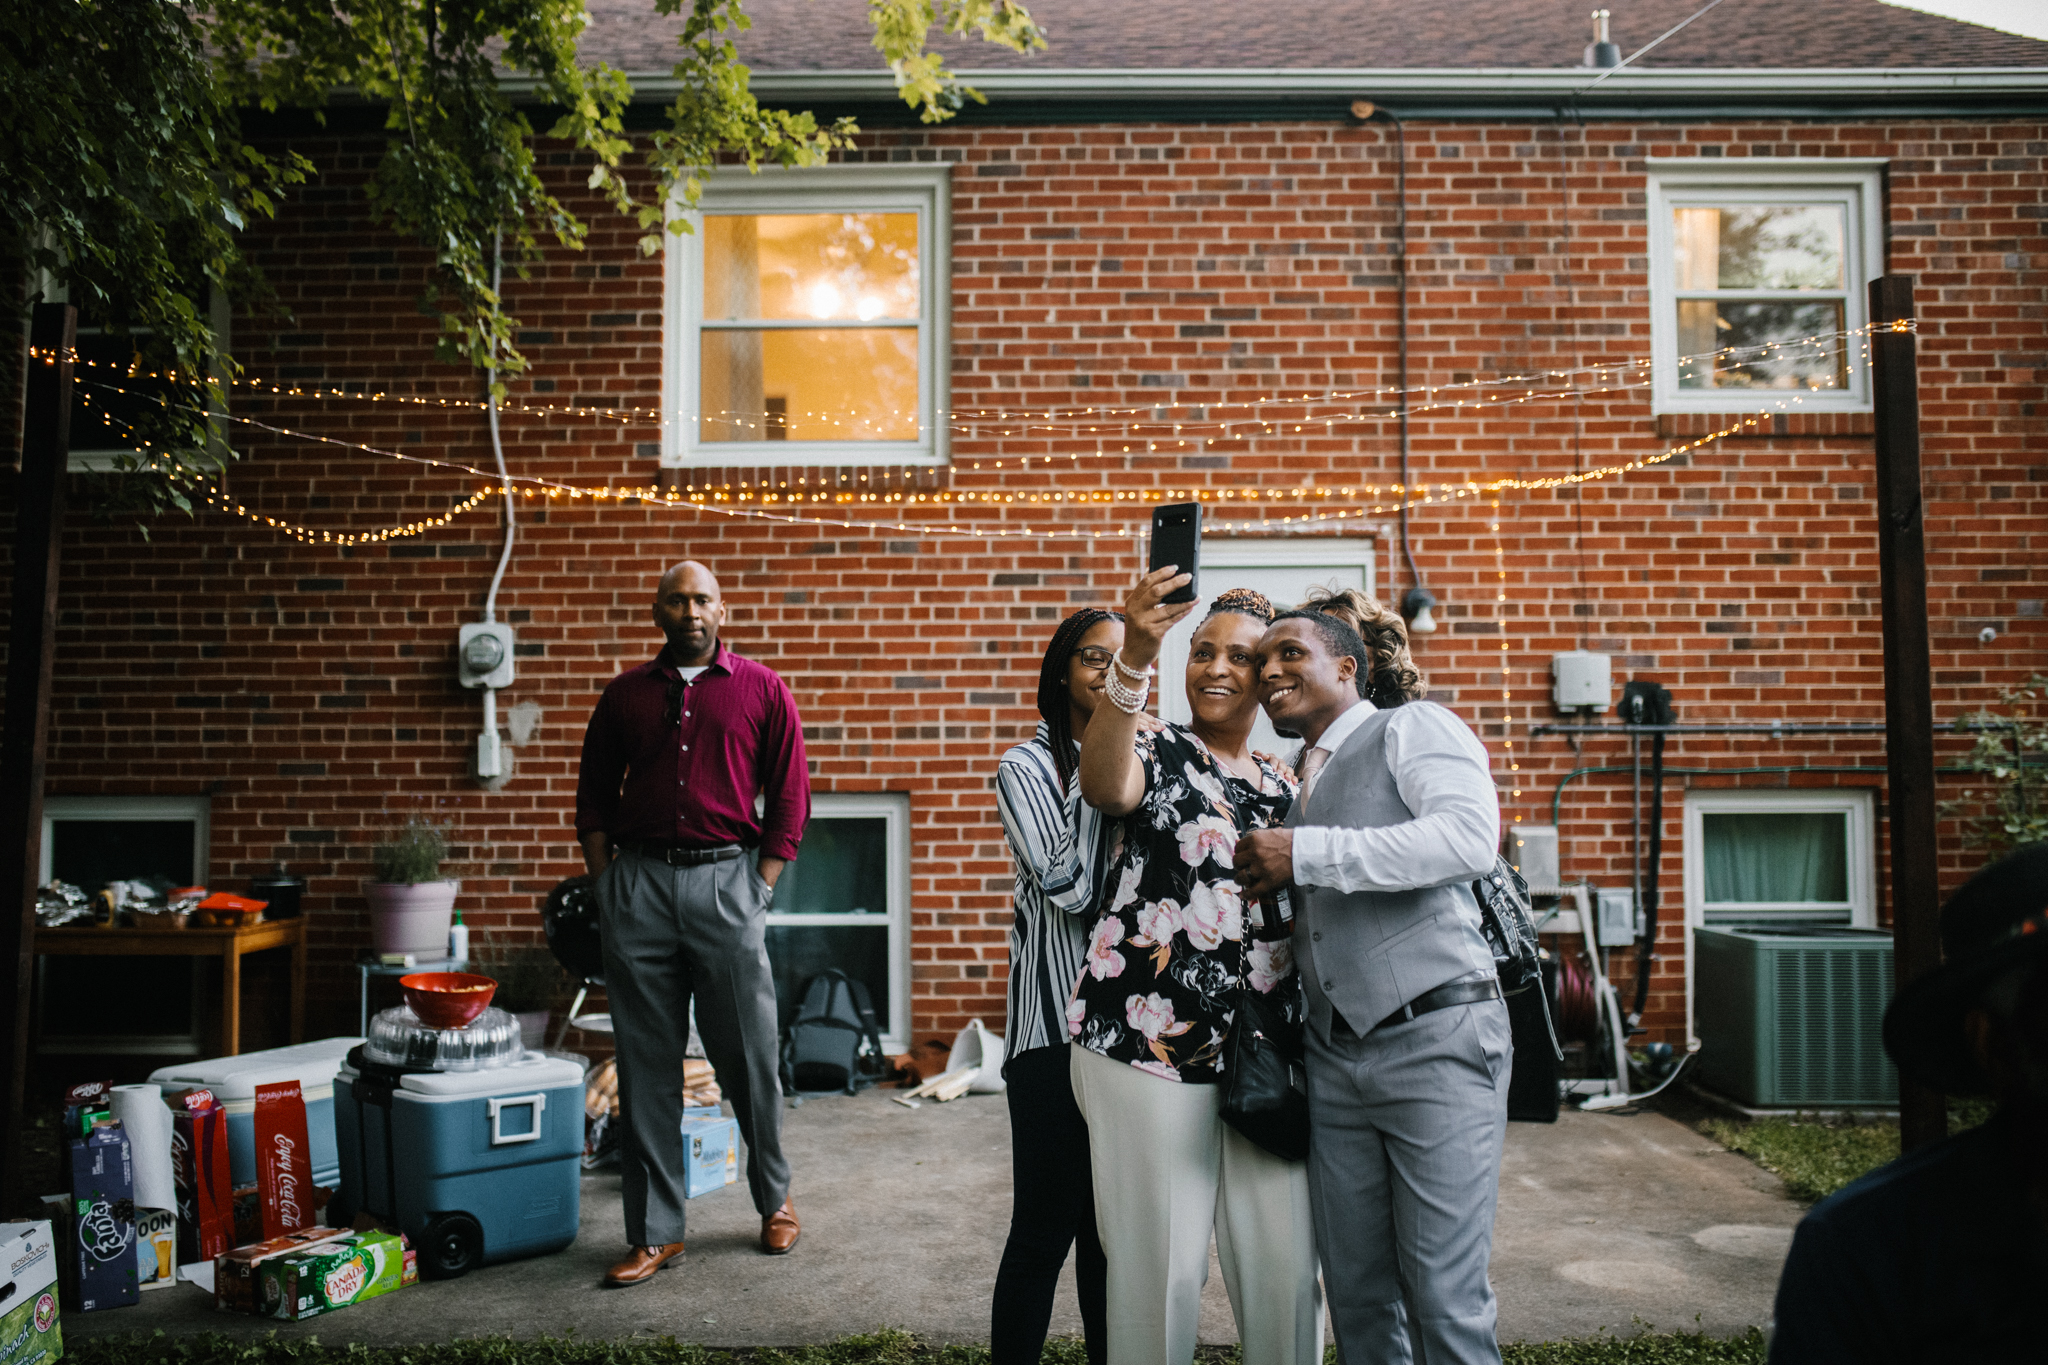 dorota_dwight_richmond_backyard_wedding-101.jpg